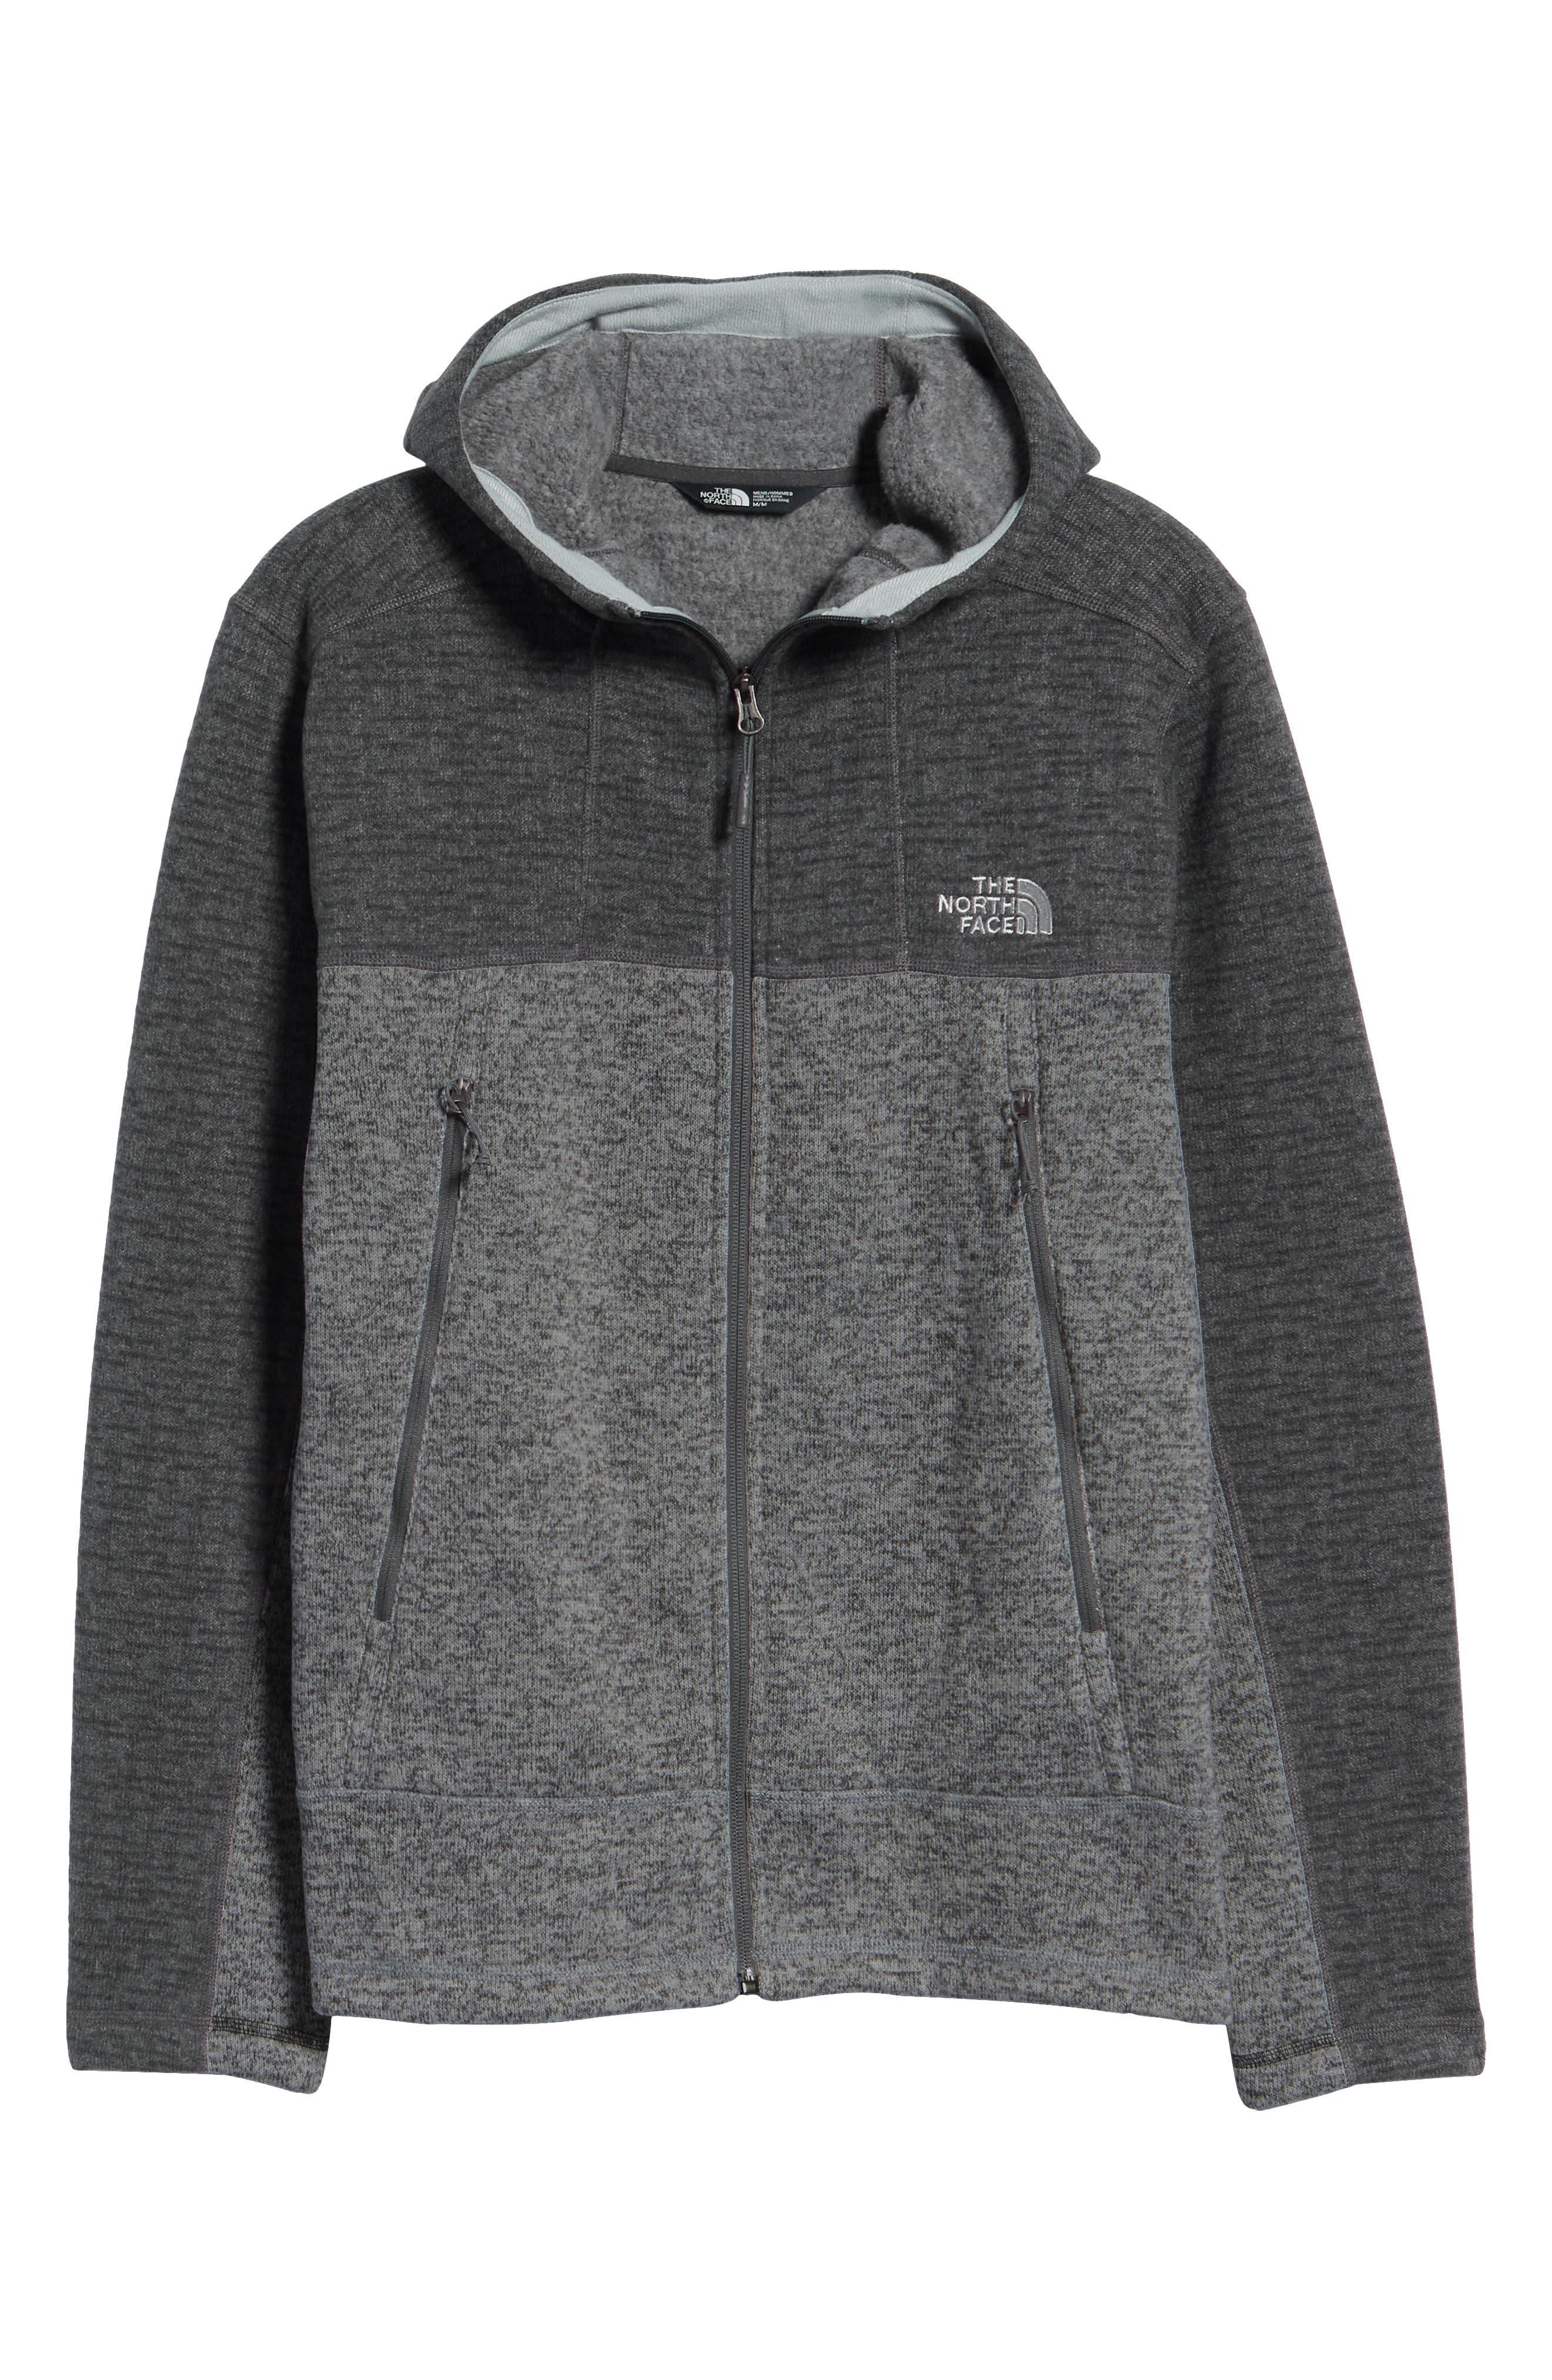 Gordon Lyons Alpine Sweater Fleece Hoodie,                             Alternate thumbnail 7, color,                             ASPHALT GREY/ MONUMENT GREY